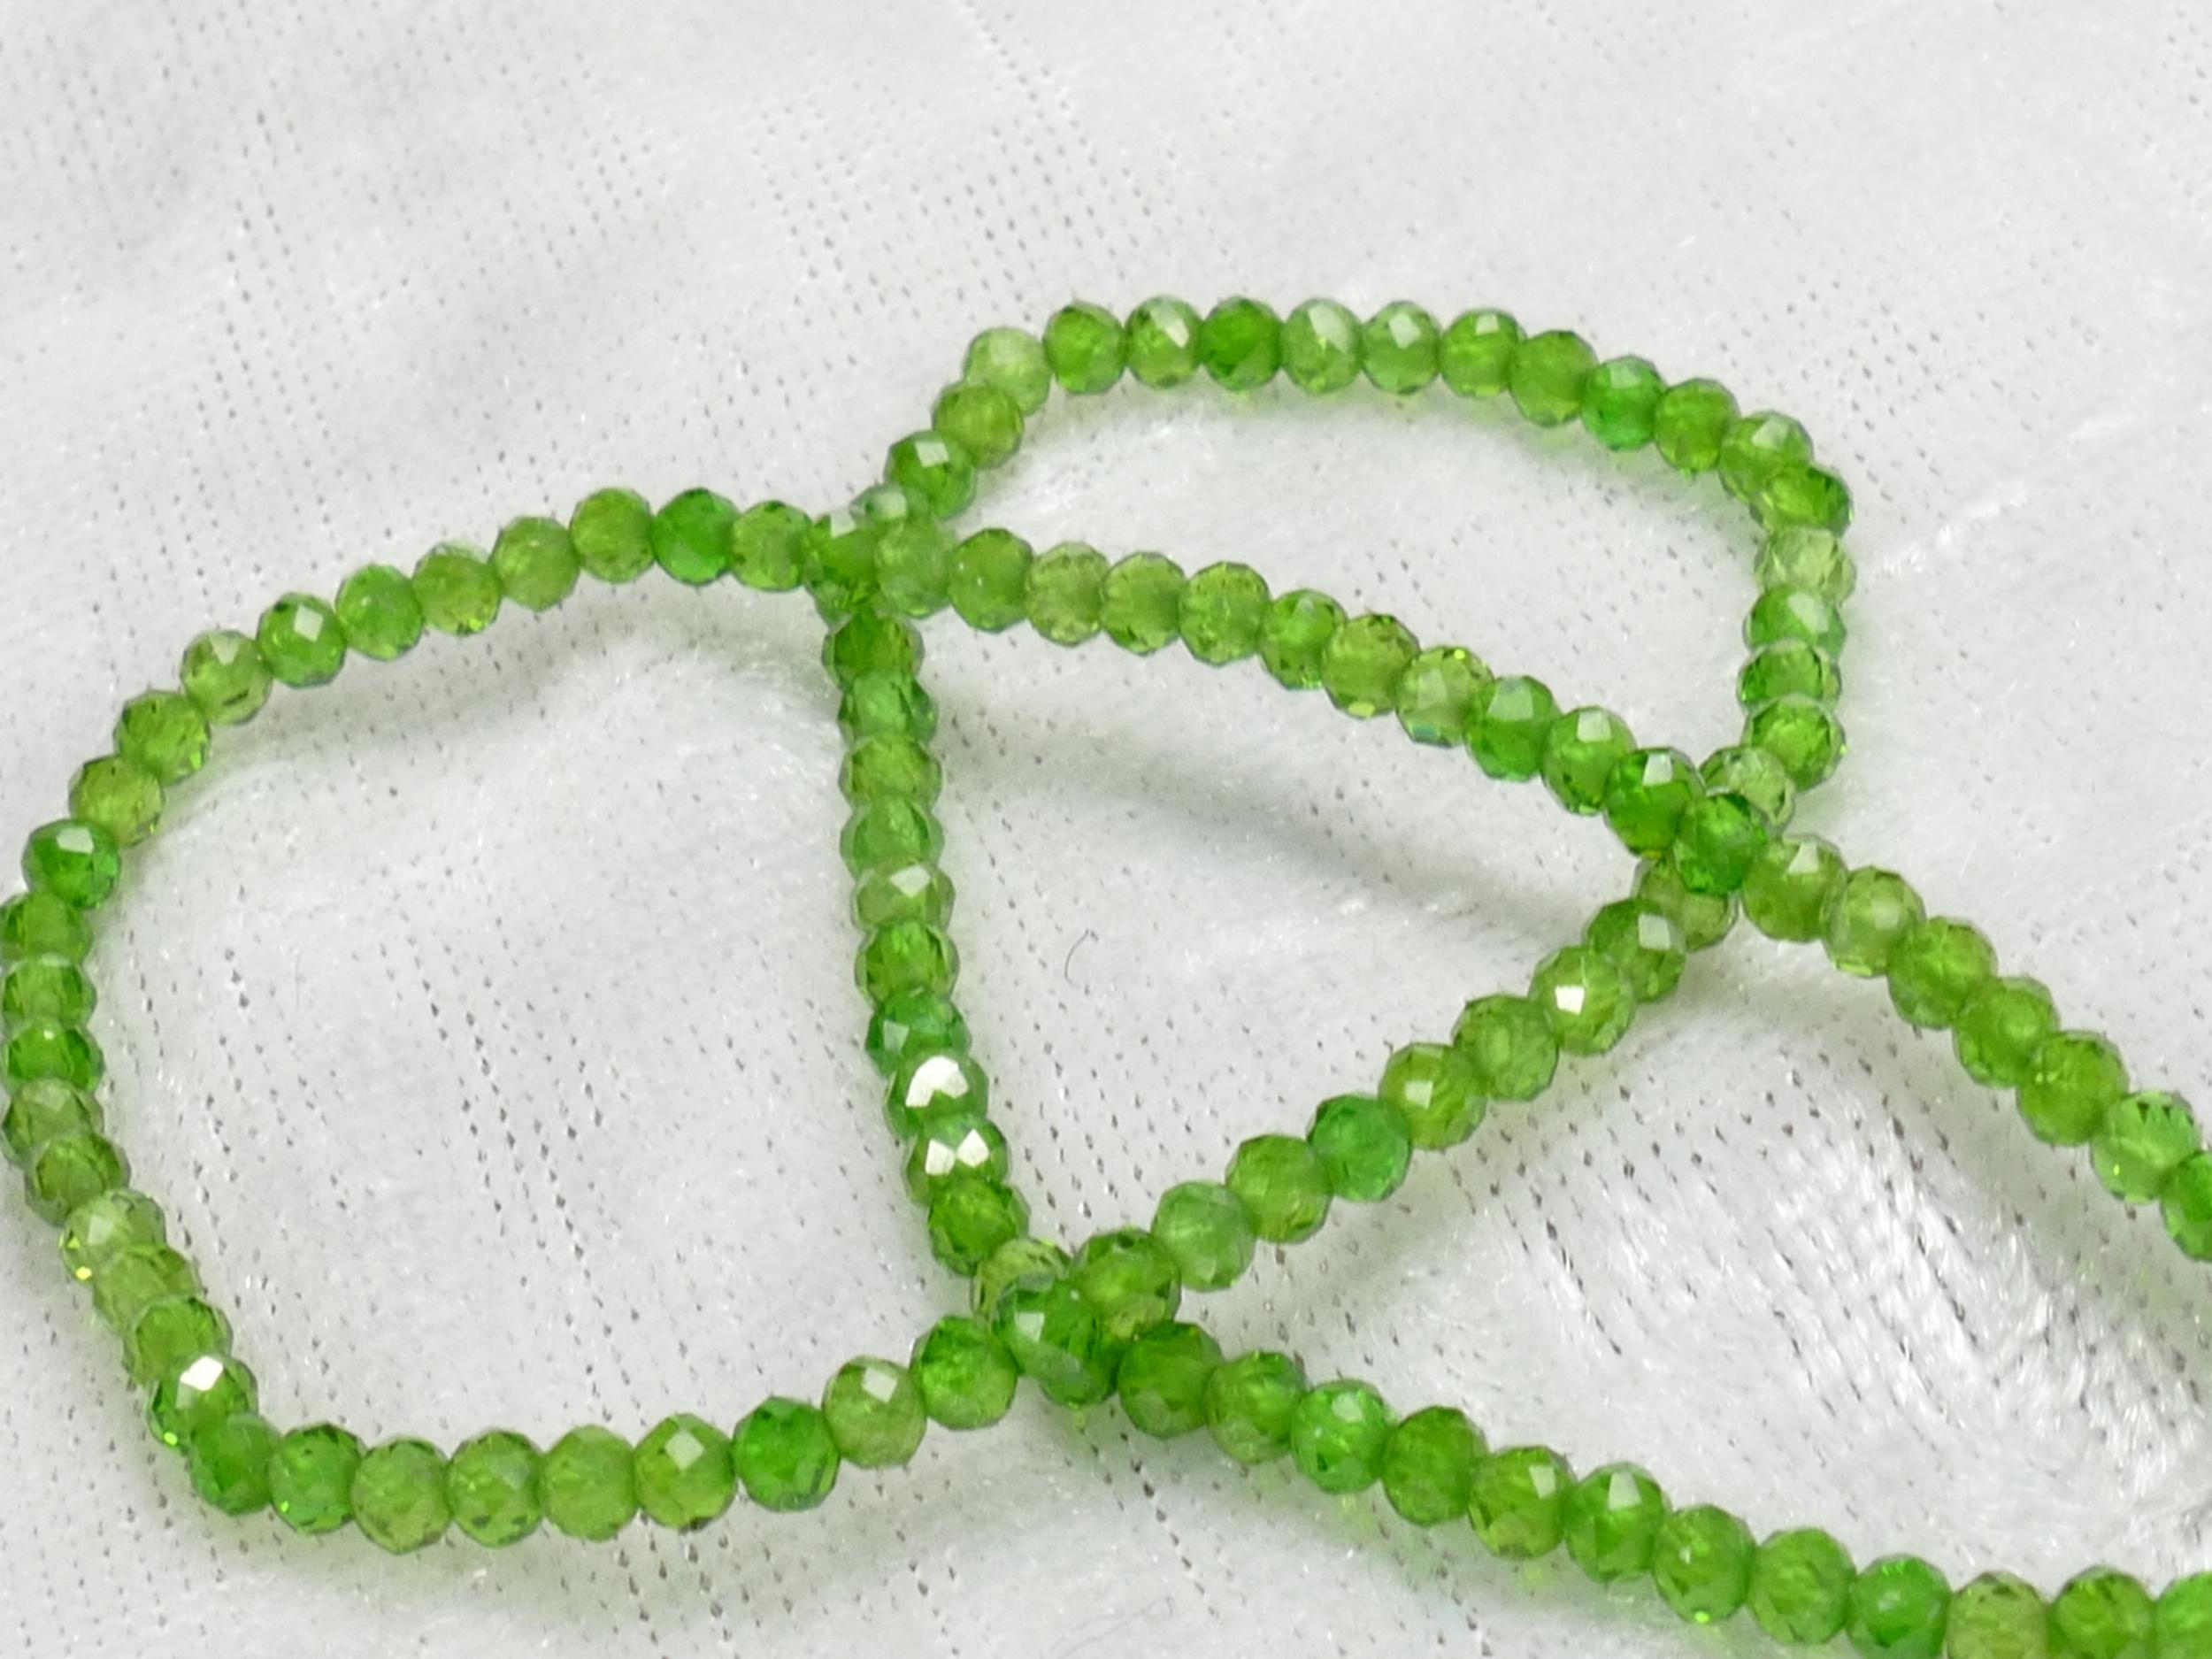 AA/AAA 2.5mm Petites perles de Diopside chromifère naturel en micro rondelle facettée x5cm (2 inch) (#AC1070)